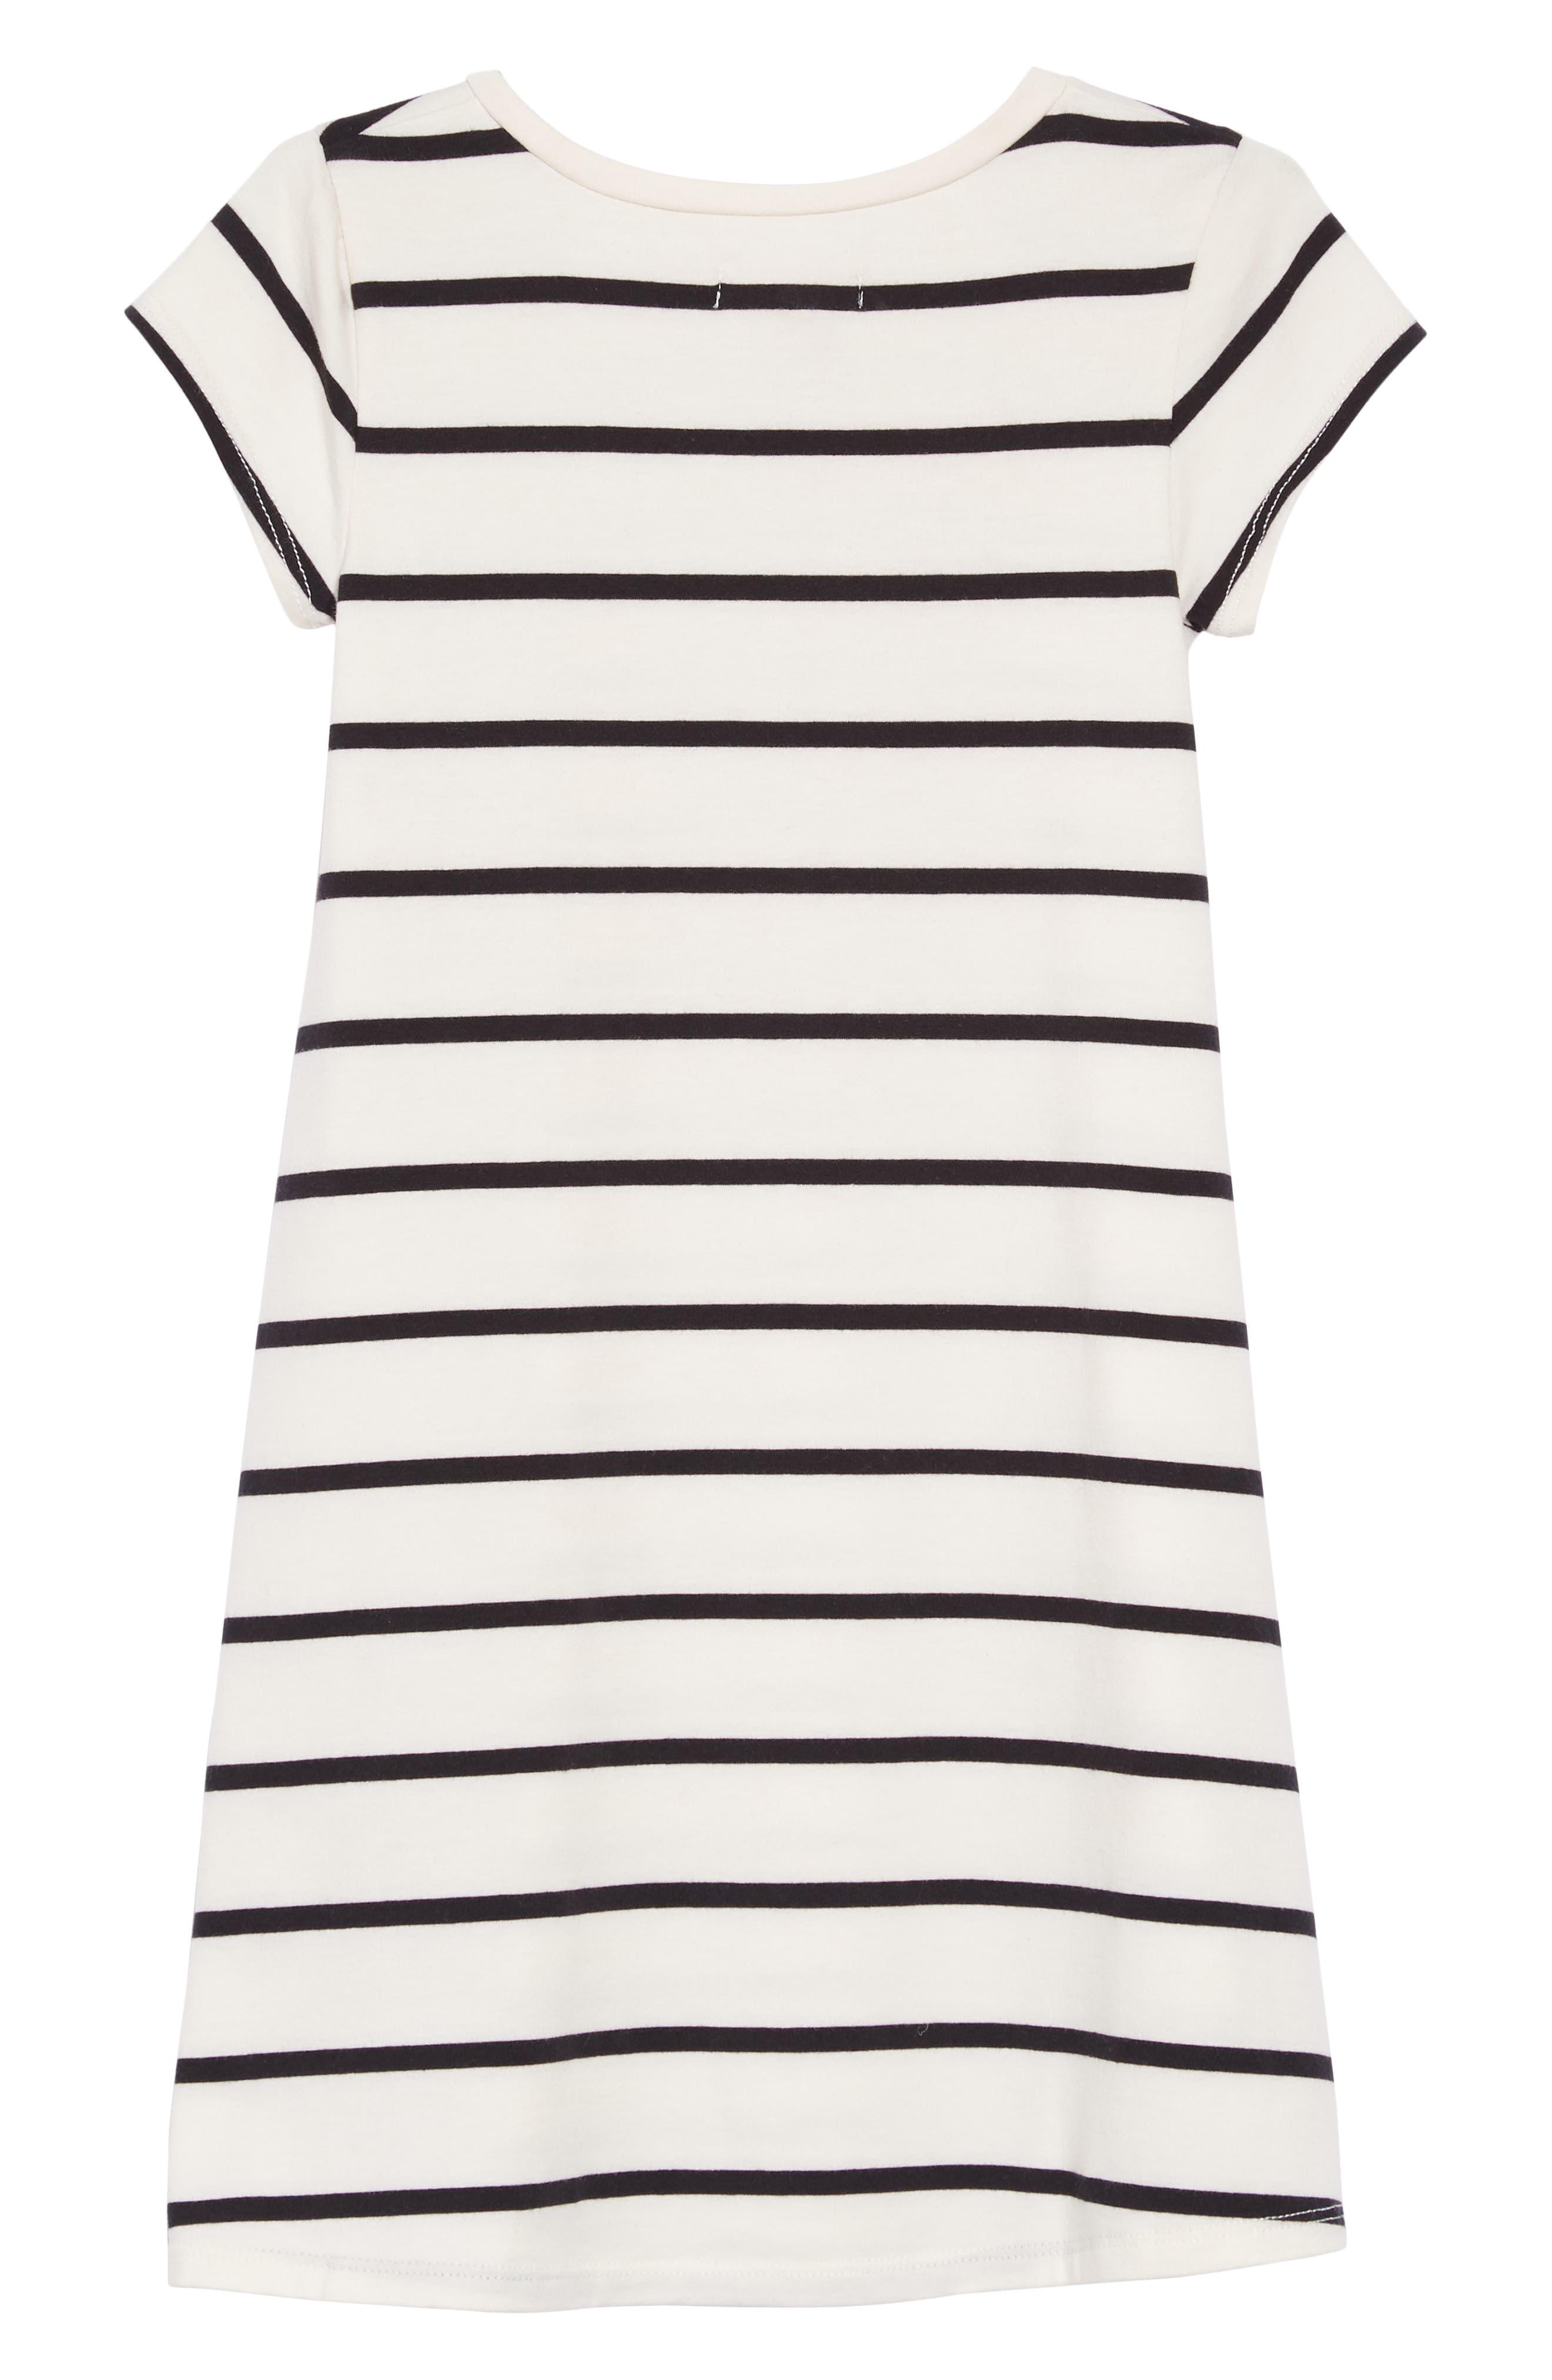 Contrast Pocket T-Shirt Dress,                             Alternate thumbnail 2, color,                             900